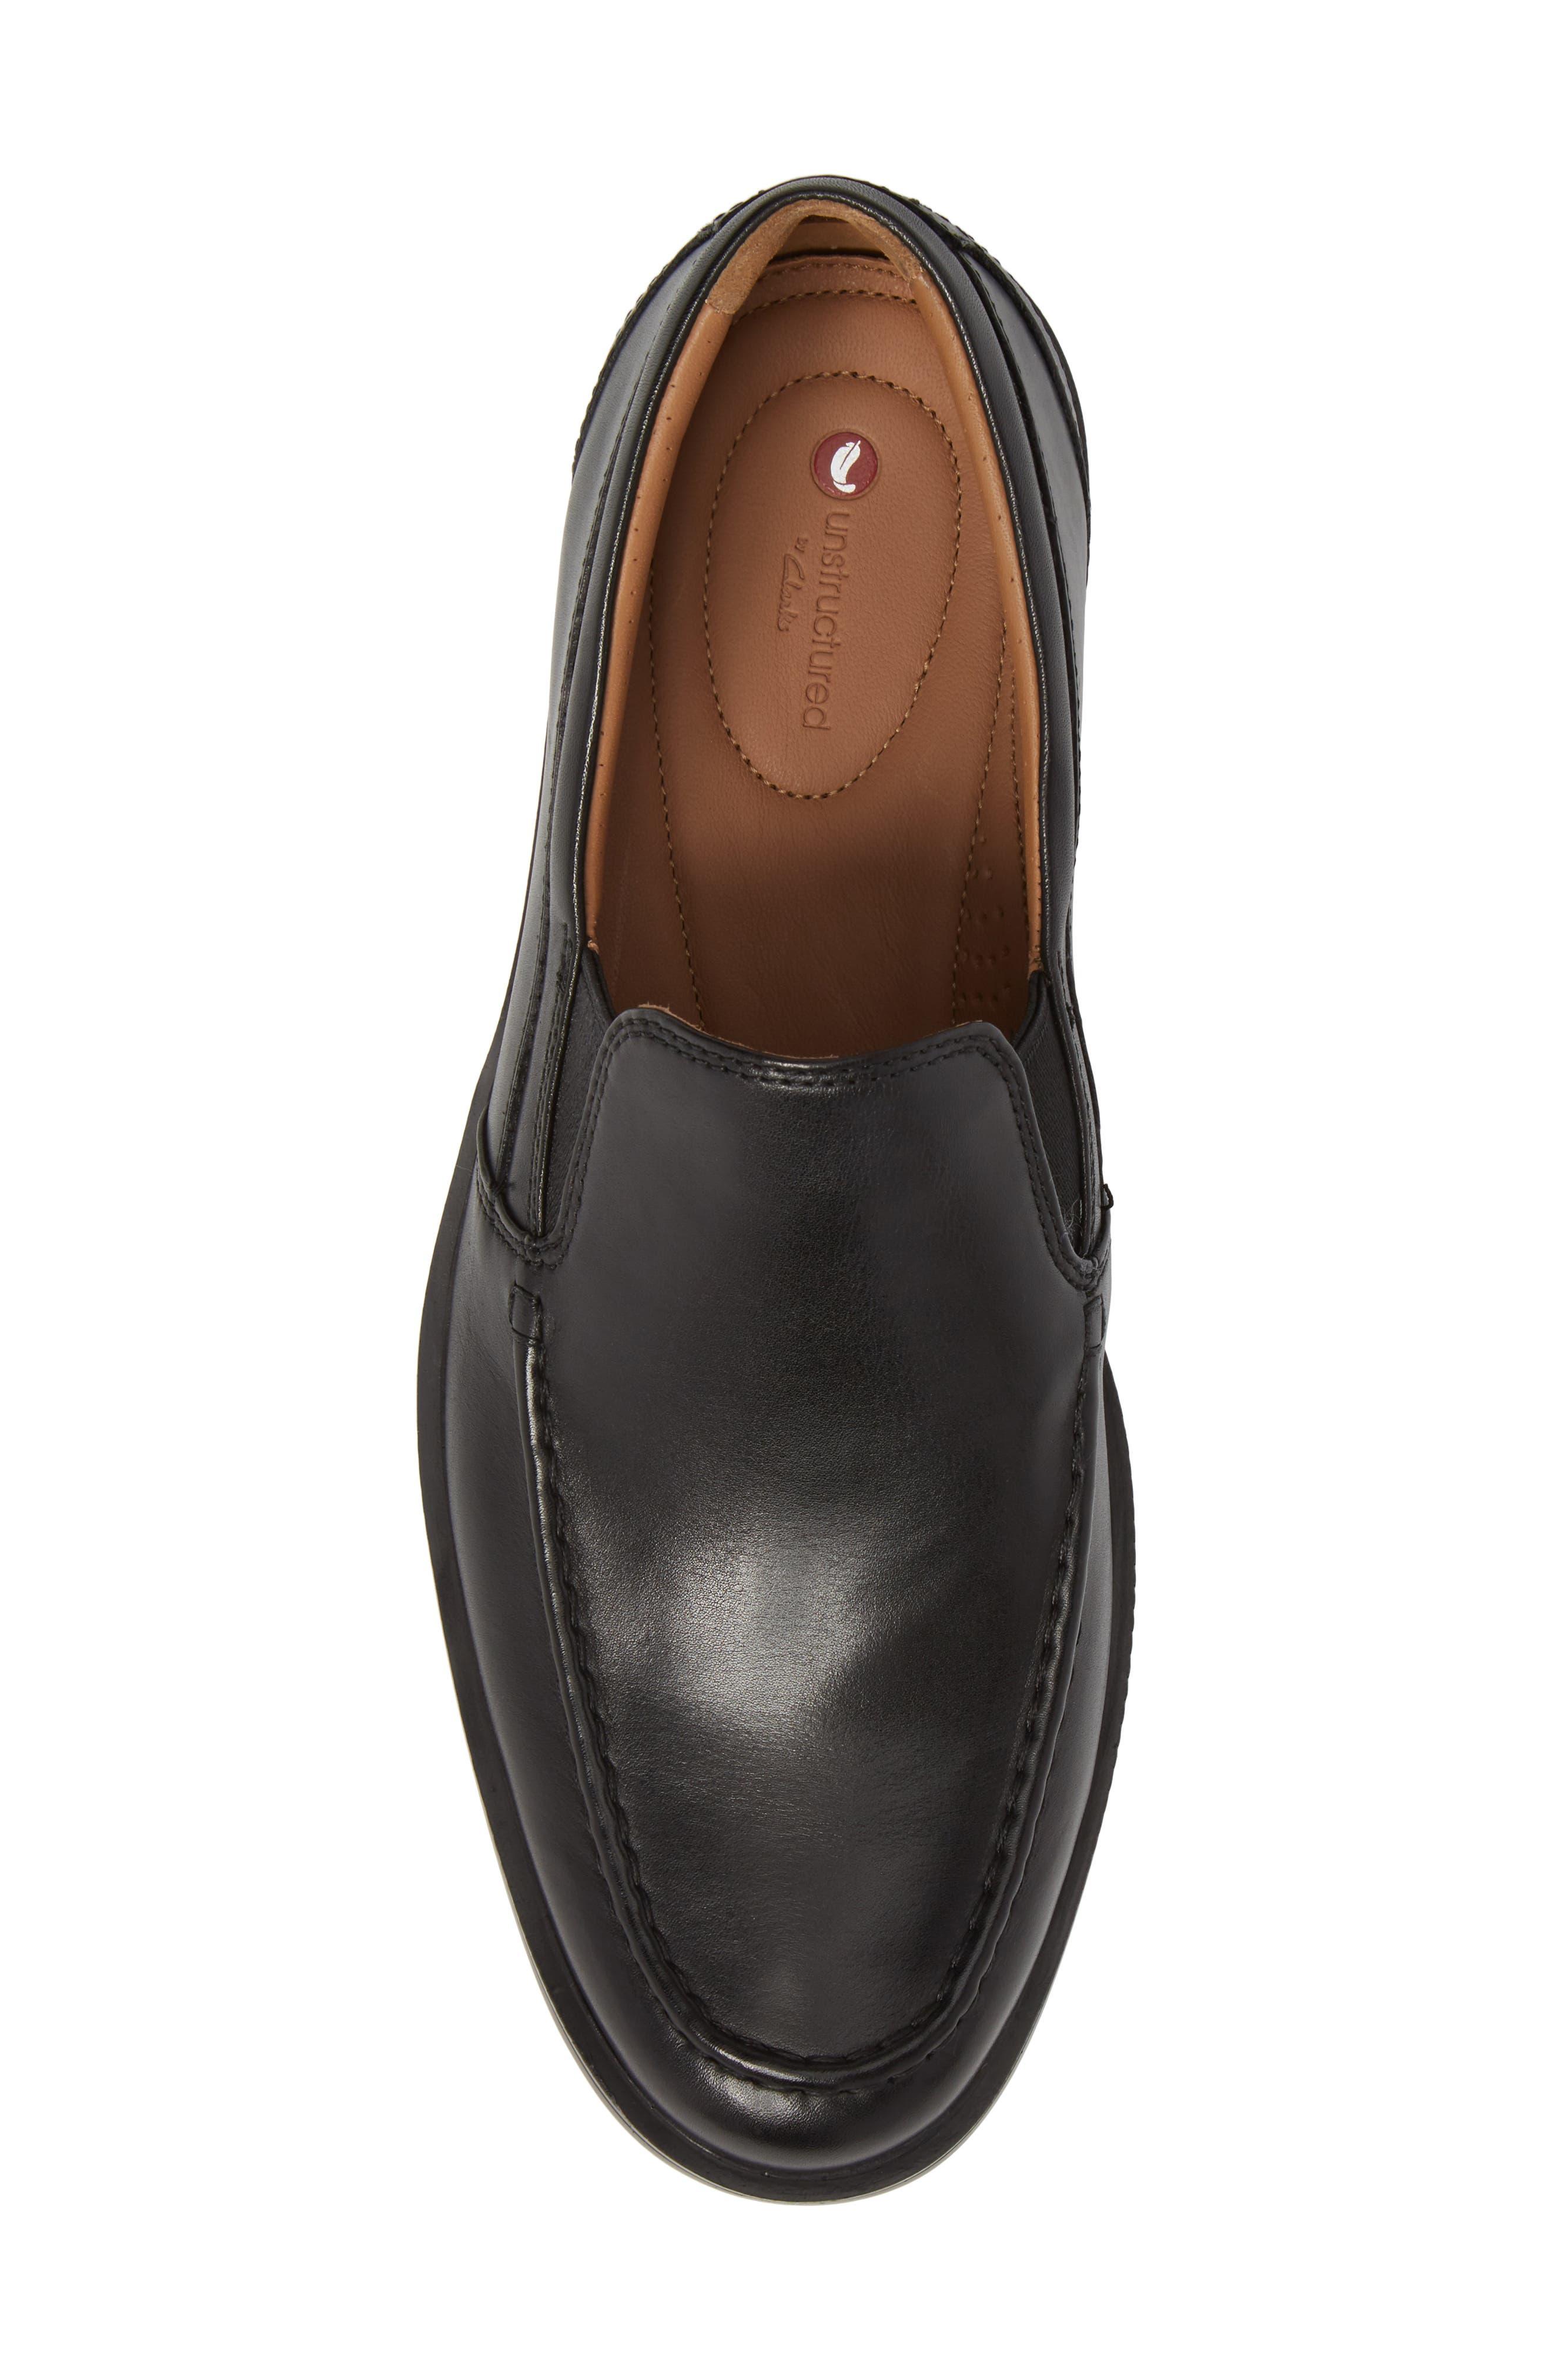 Unaldric Apron Toe Loafer,                             Alternate thumbnail 5, color,                             Black Leather